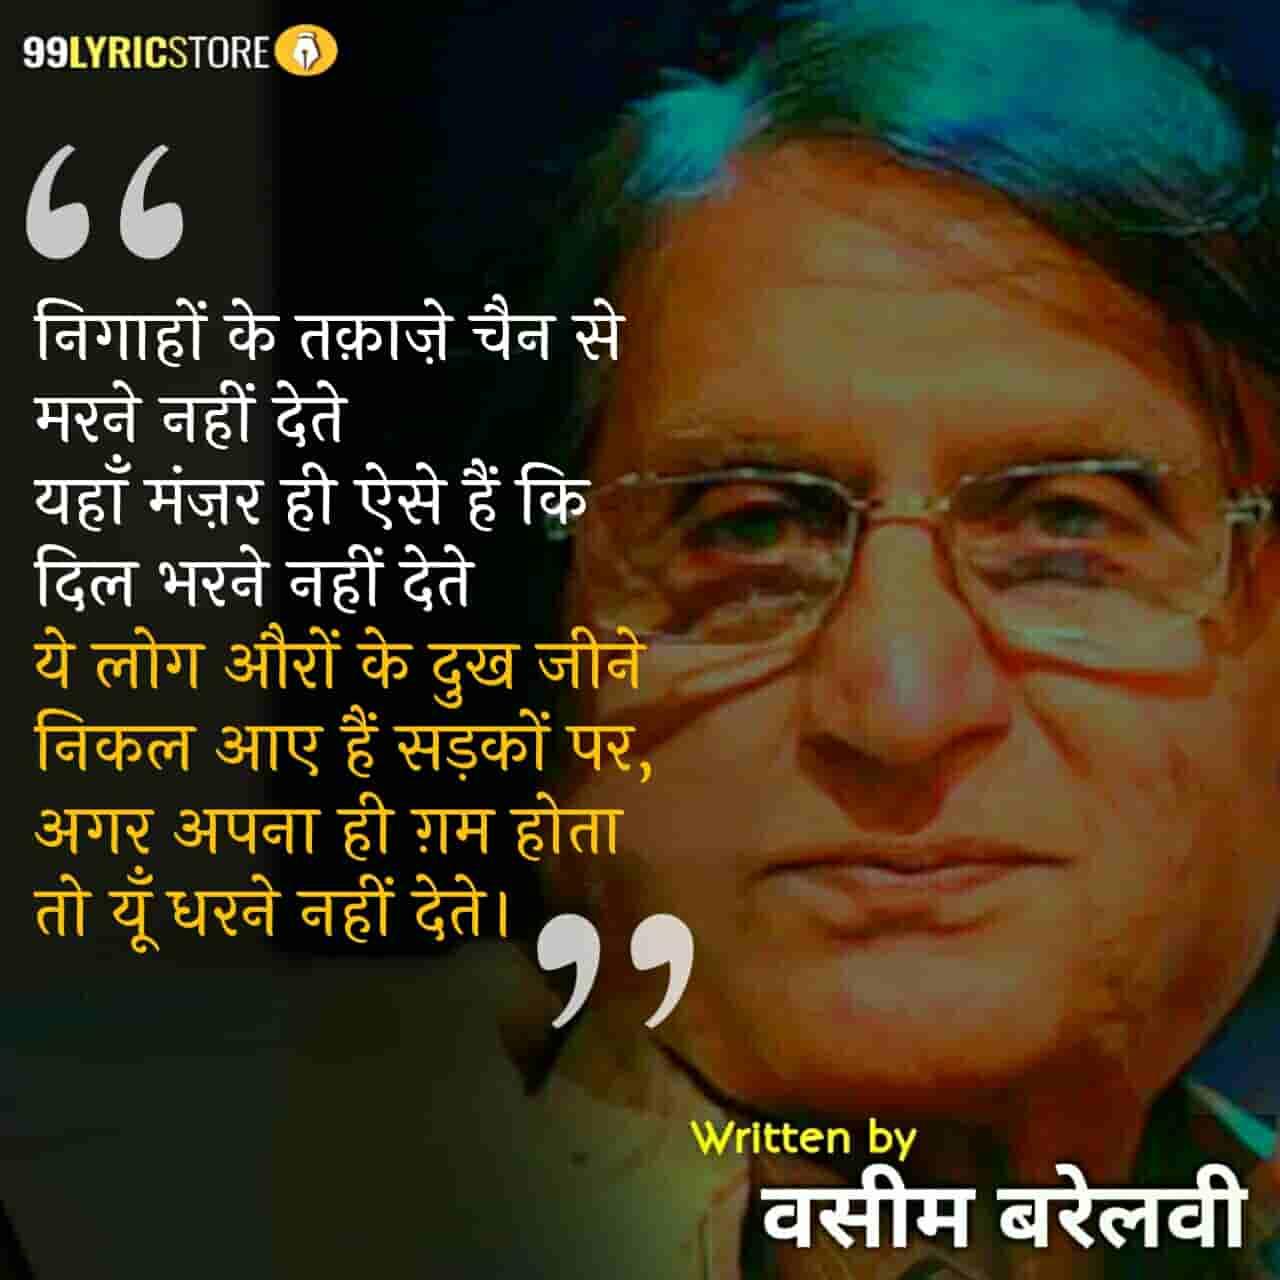 This beautiful ghazal 'Nigahon Ke Taqaze Chain Se Marne Nahin Dete' has written by Waseem Barelvi.